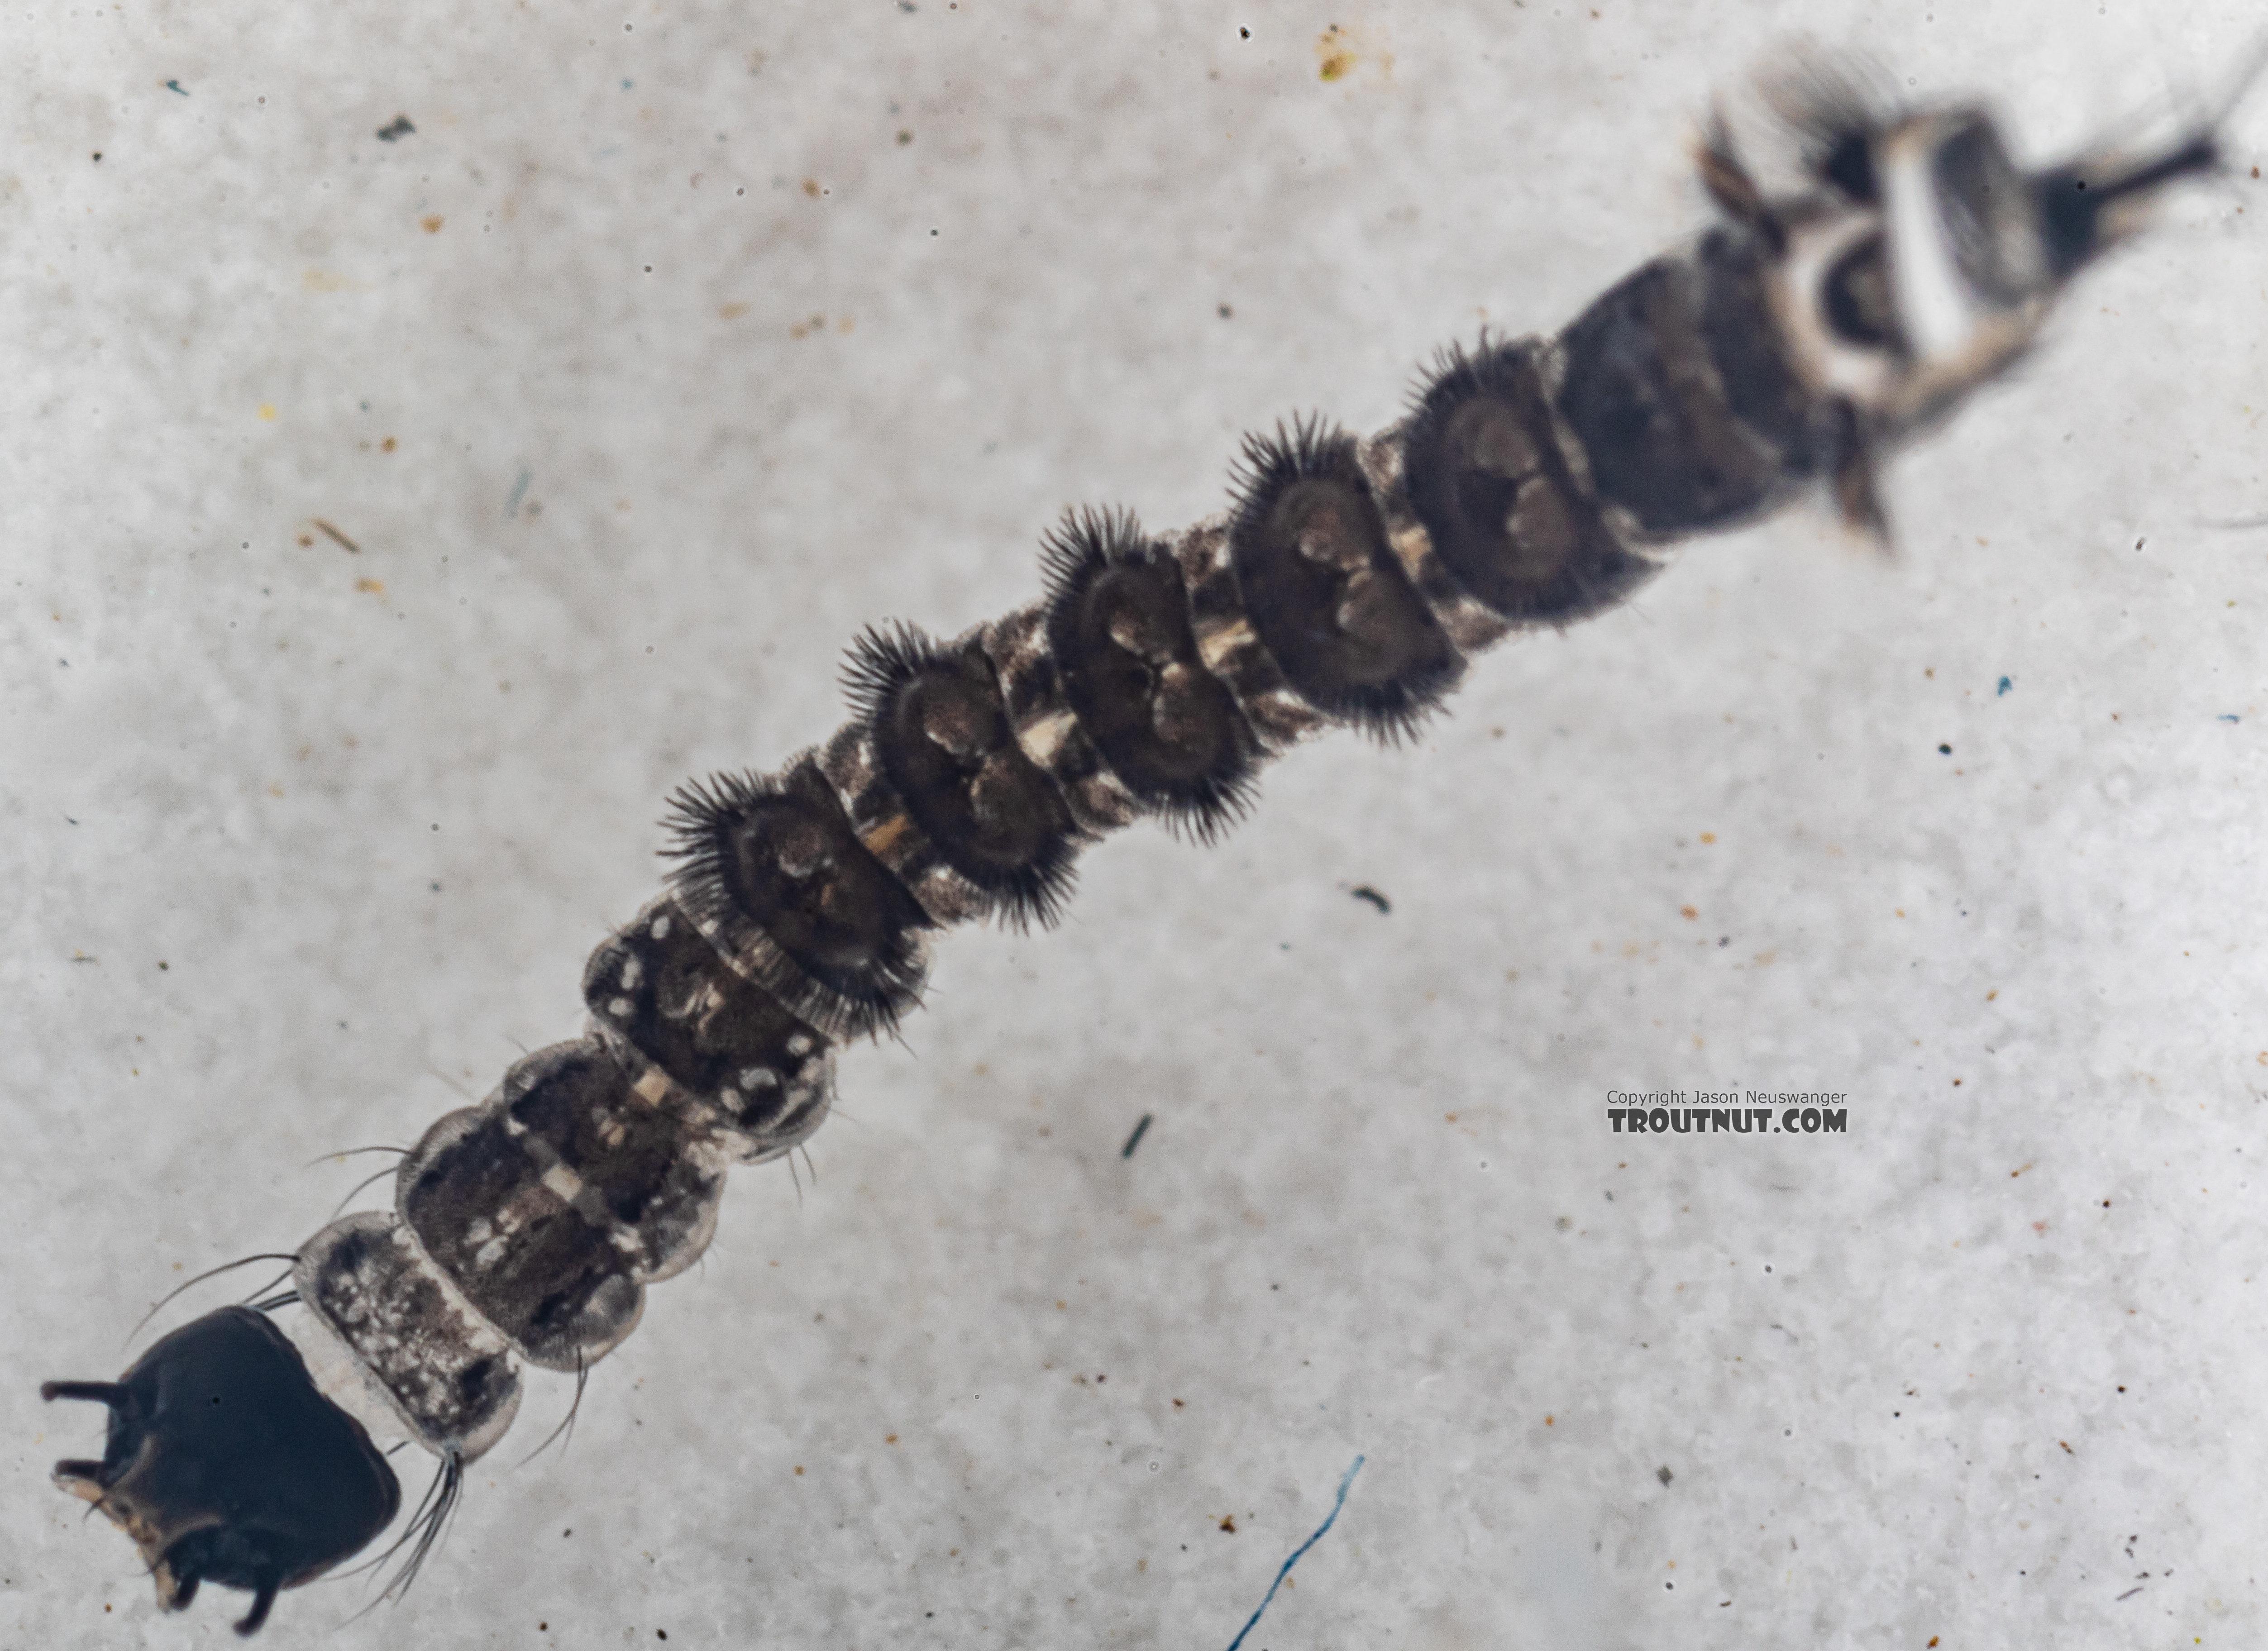 Dixa True Fly Larva from Mystery Creek #249 in Washington